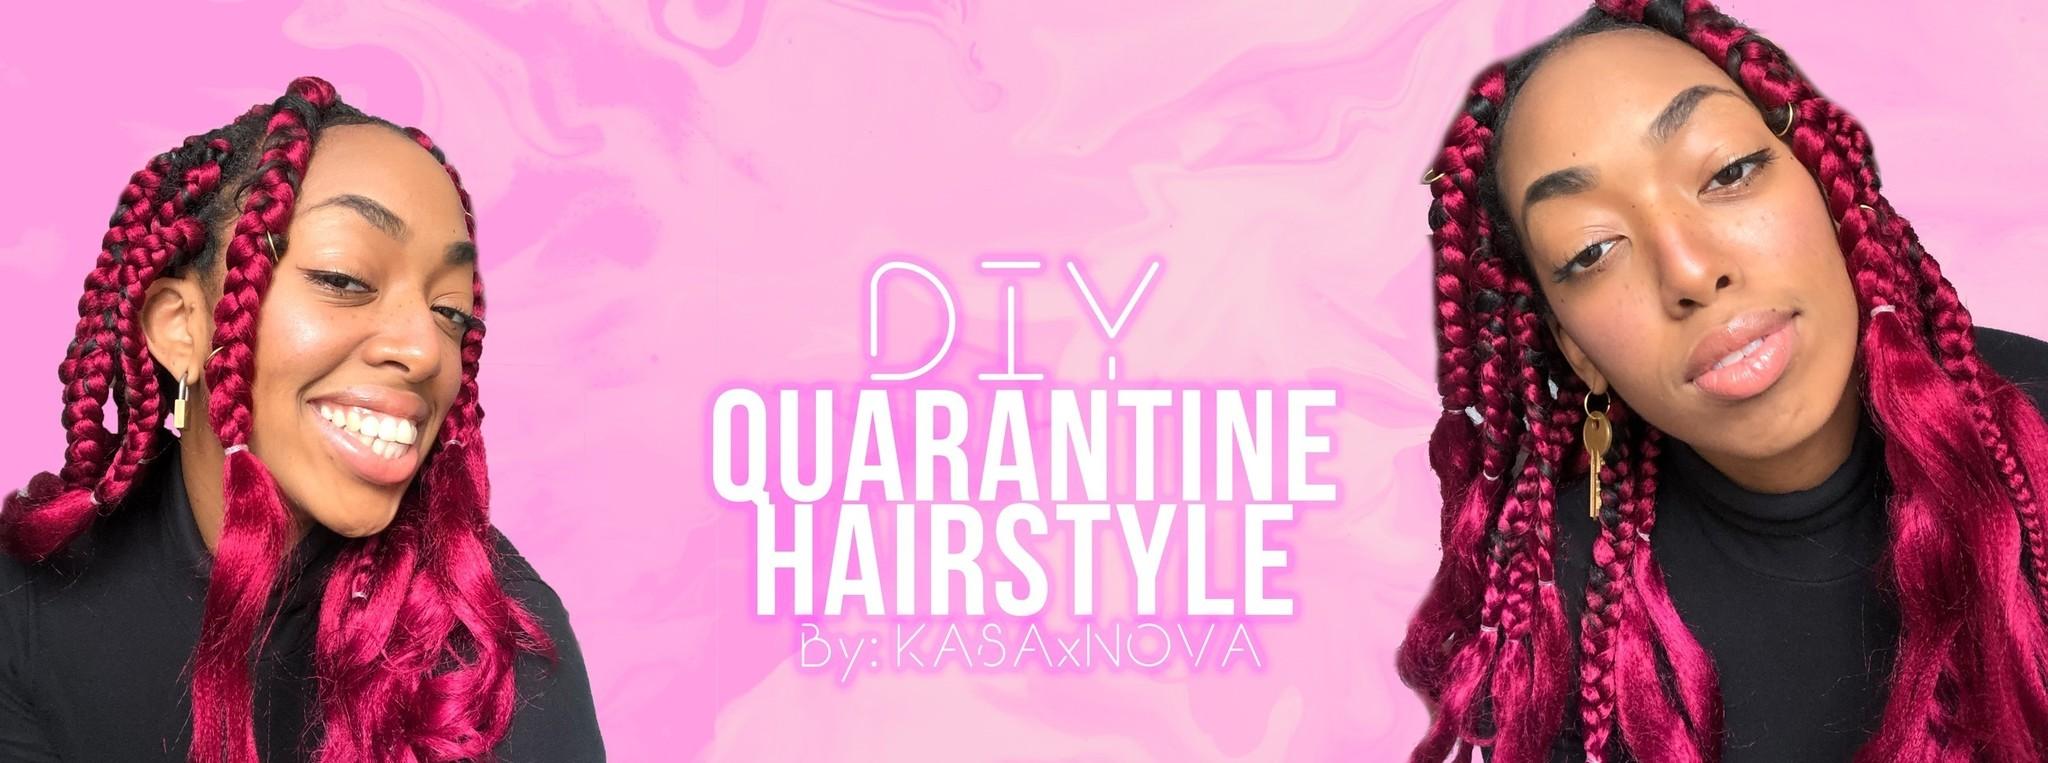 DIY Quarantine Hairstyle